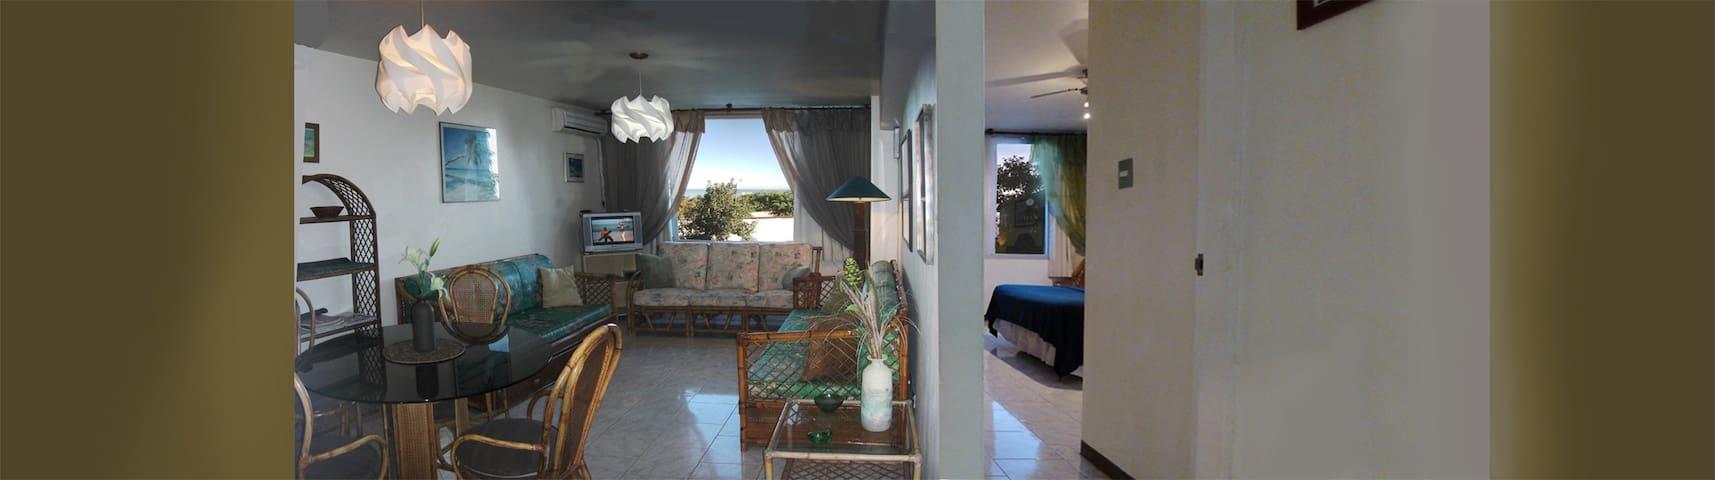 BRISAS DEL LITORAL APARTOCLUB - Caraballeda - Lägenhet